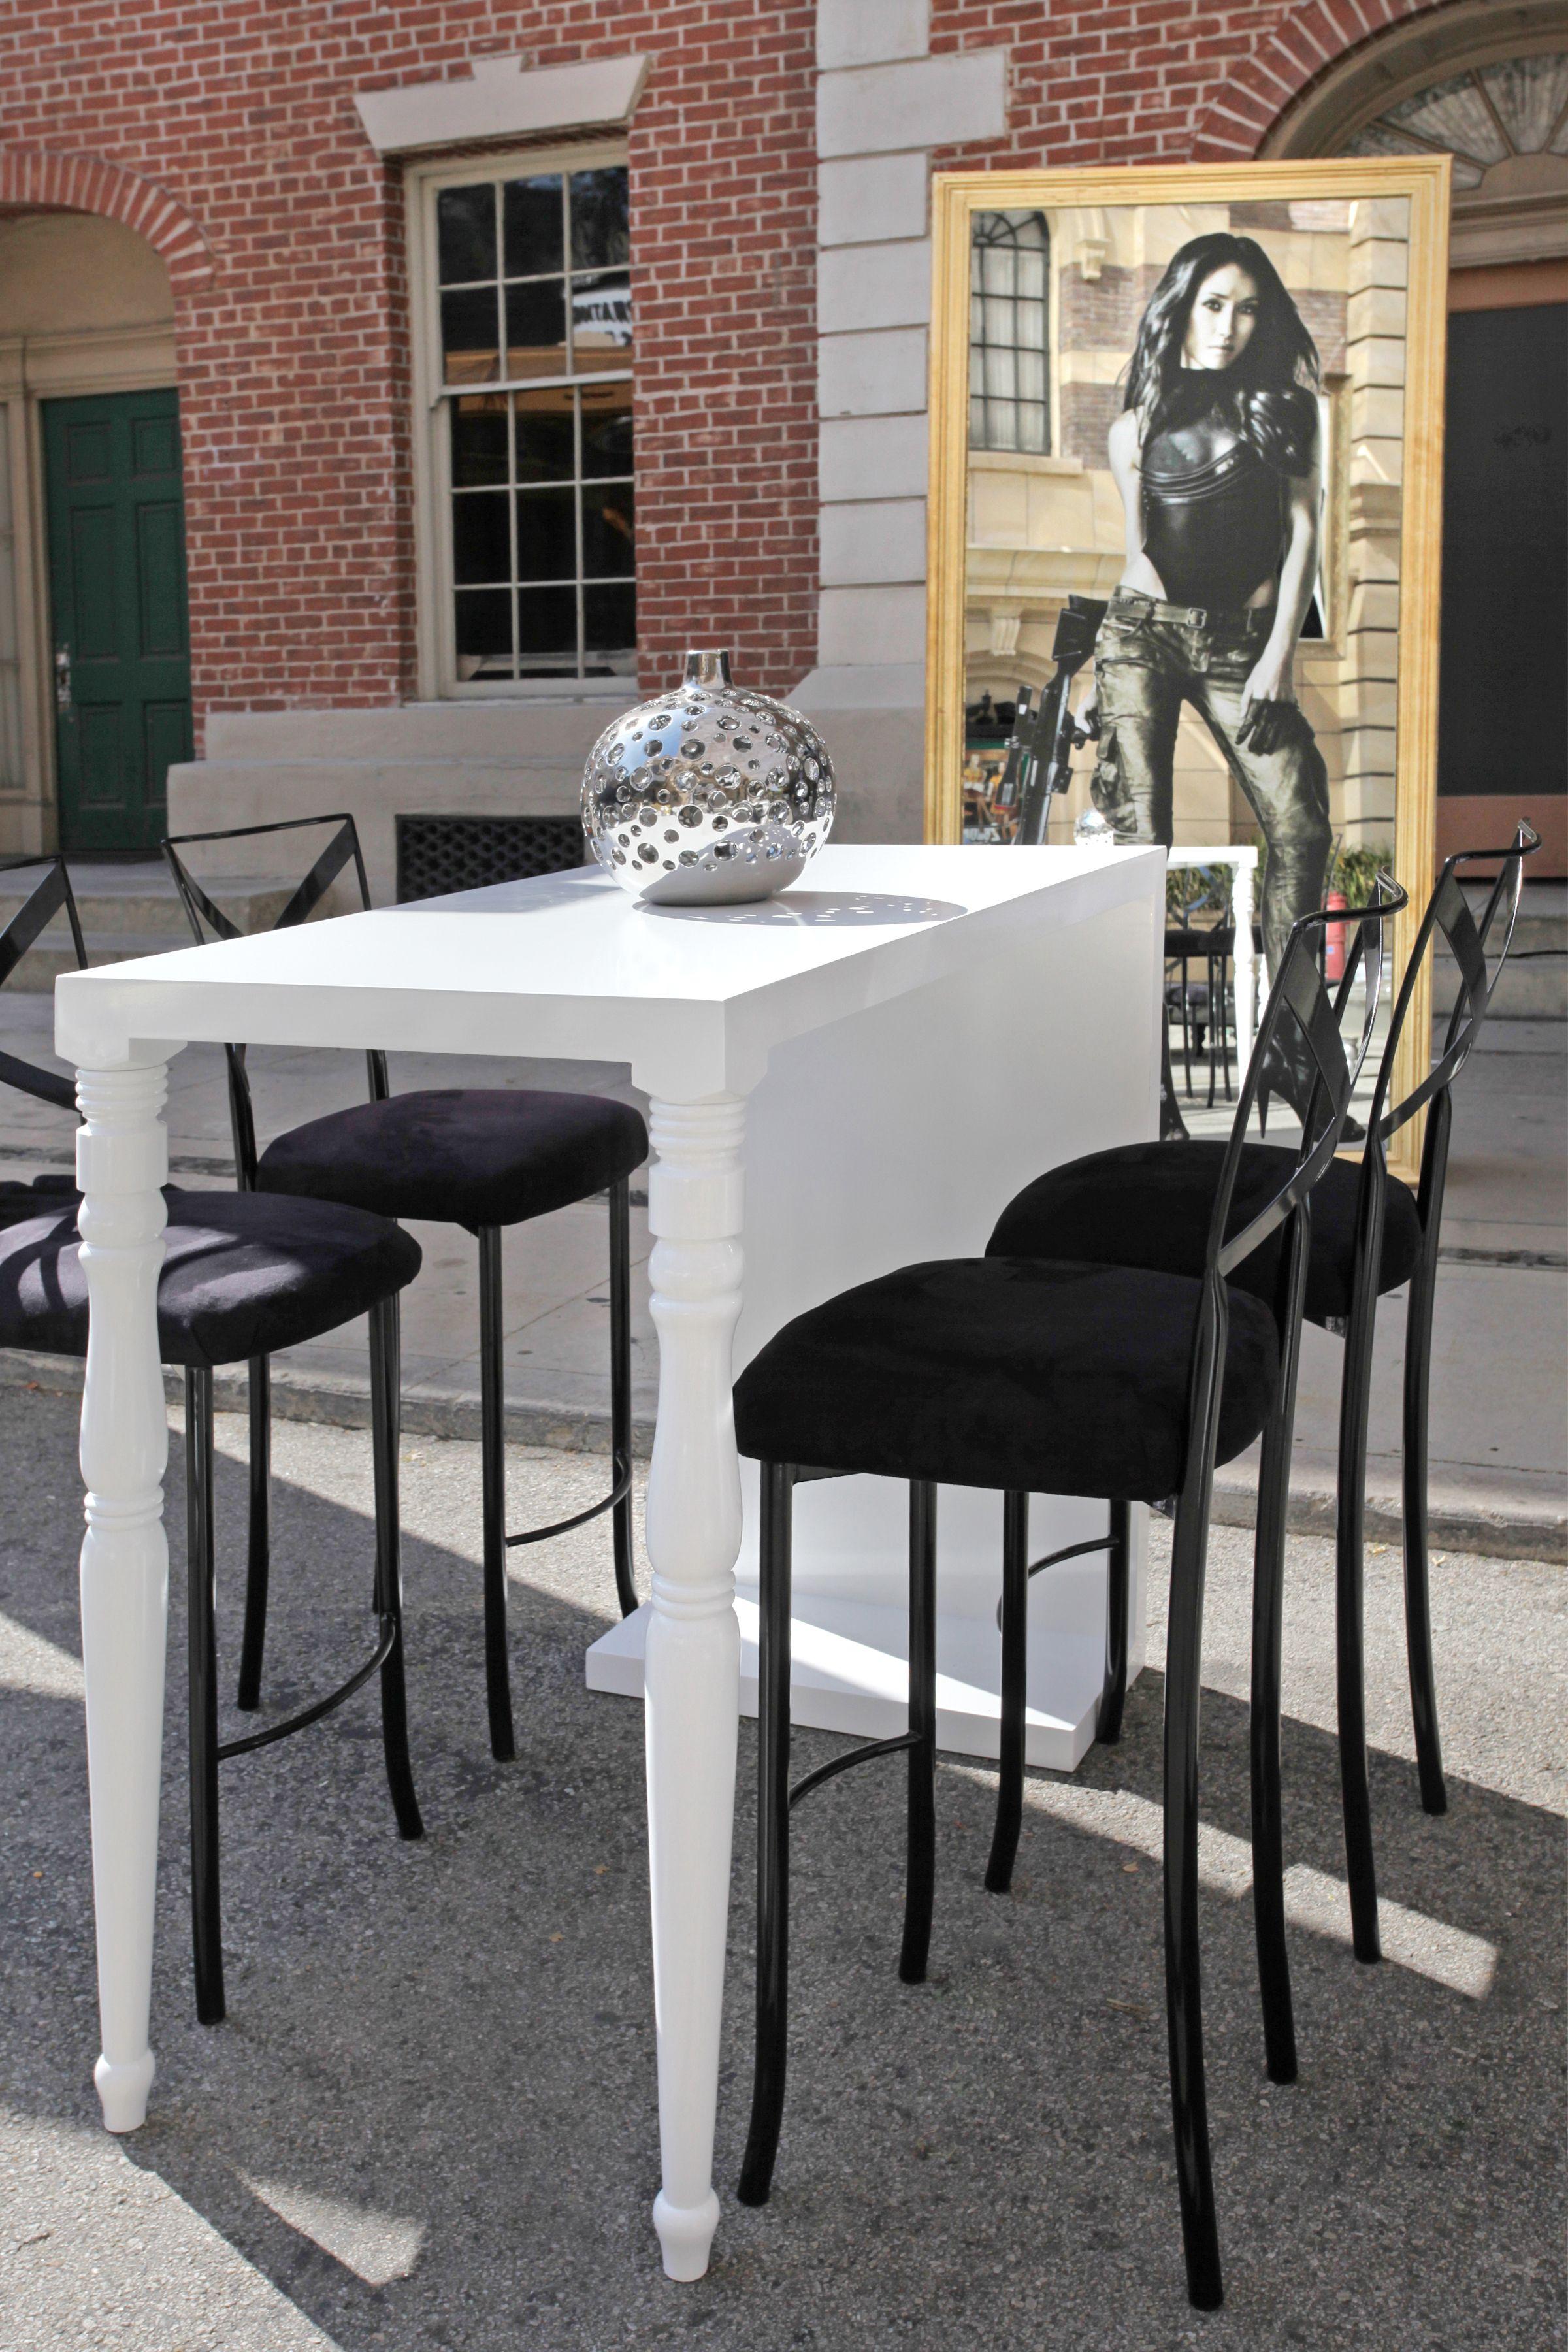 SoBe Hi Boy Table Black stools Divine Dining Lounge  : 1e1c8c8b9bbcfb6dee69544df22f2e51 from www.pinterest.com size 2400 x 3600 jpeg 5079kB